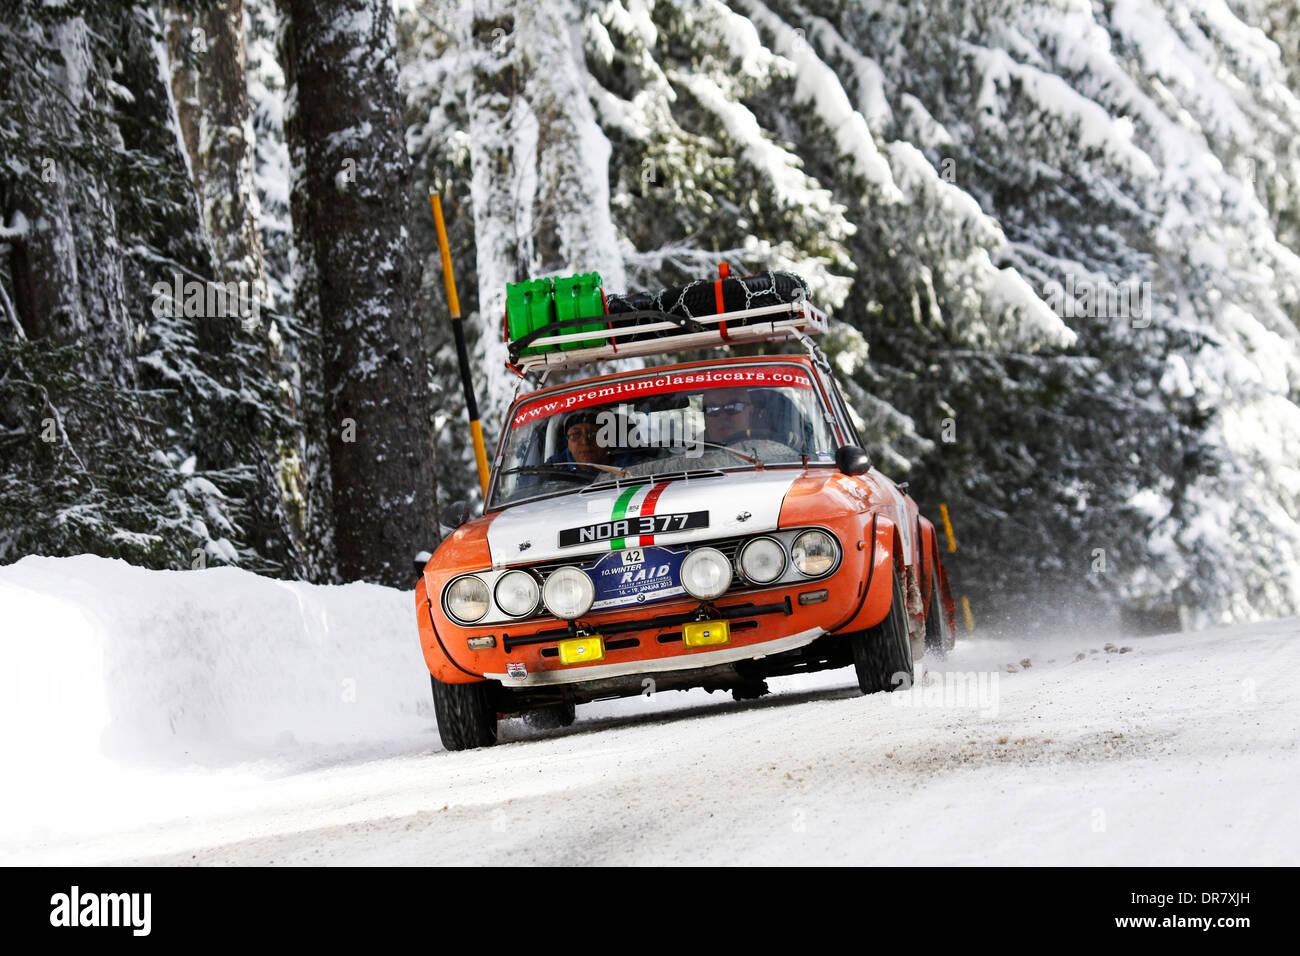 Vintage car rally, WinterRAID 2013, Lancia Fulvia, built in 1972, Engadin, Switzerland - Stock Image